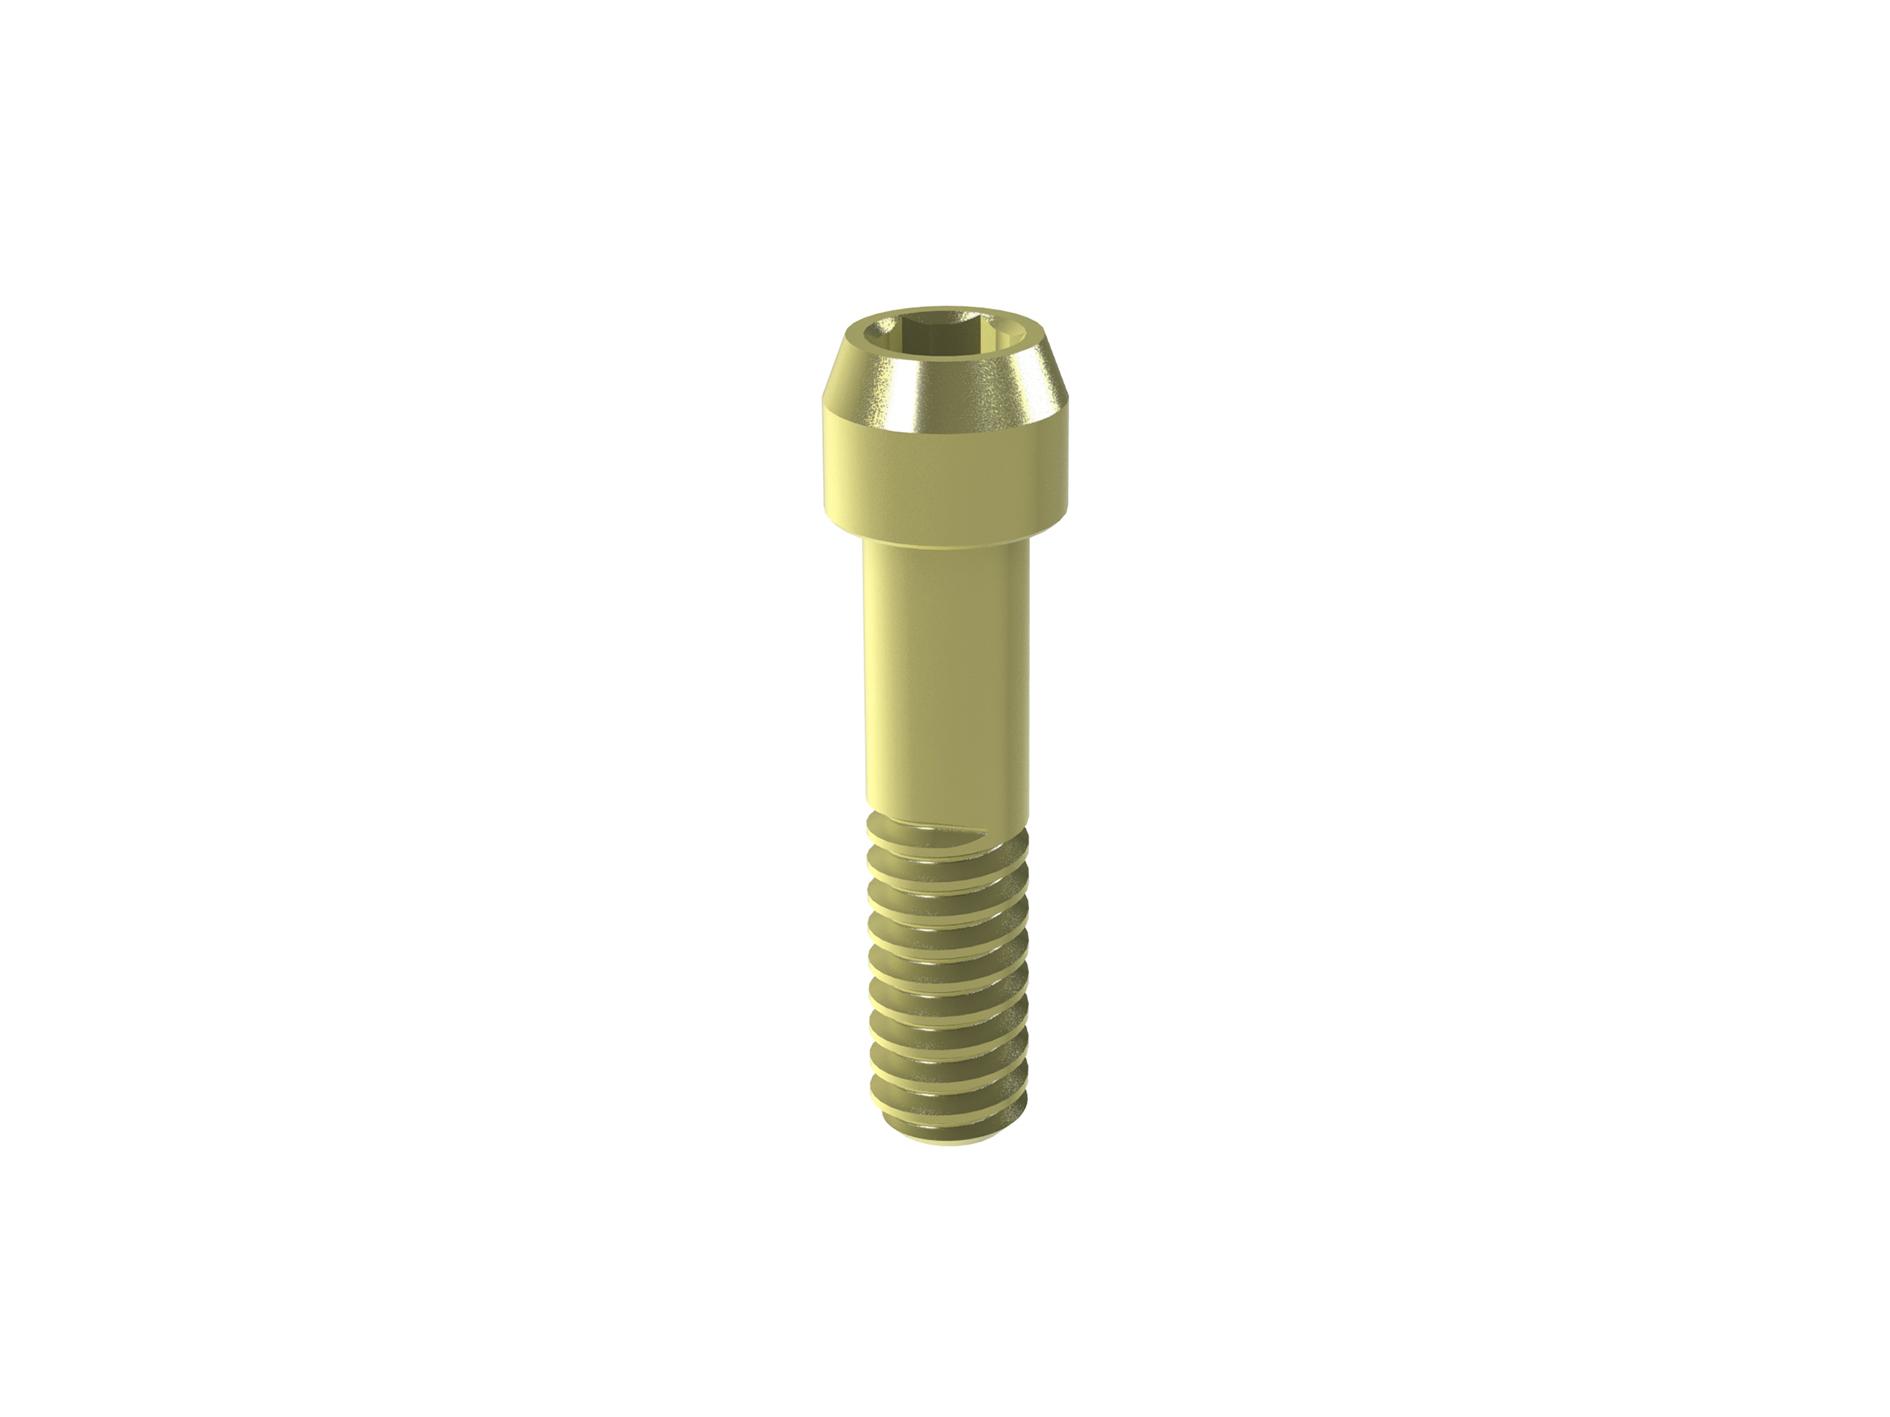 Laborschraube M 1,6 ( gelb )   Art.-Nr. 24.018.00.080  Plattform: 3,5 / 4,0  Preis  6€   ab 5 Stk.  4€   ab 10 Stk.  3,50€